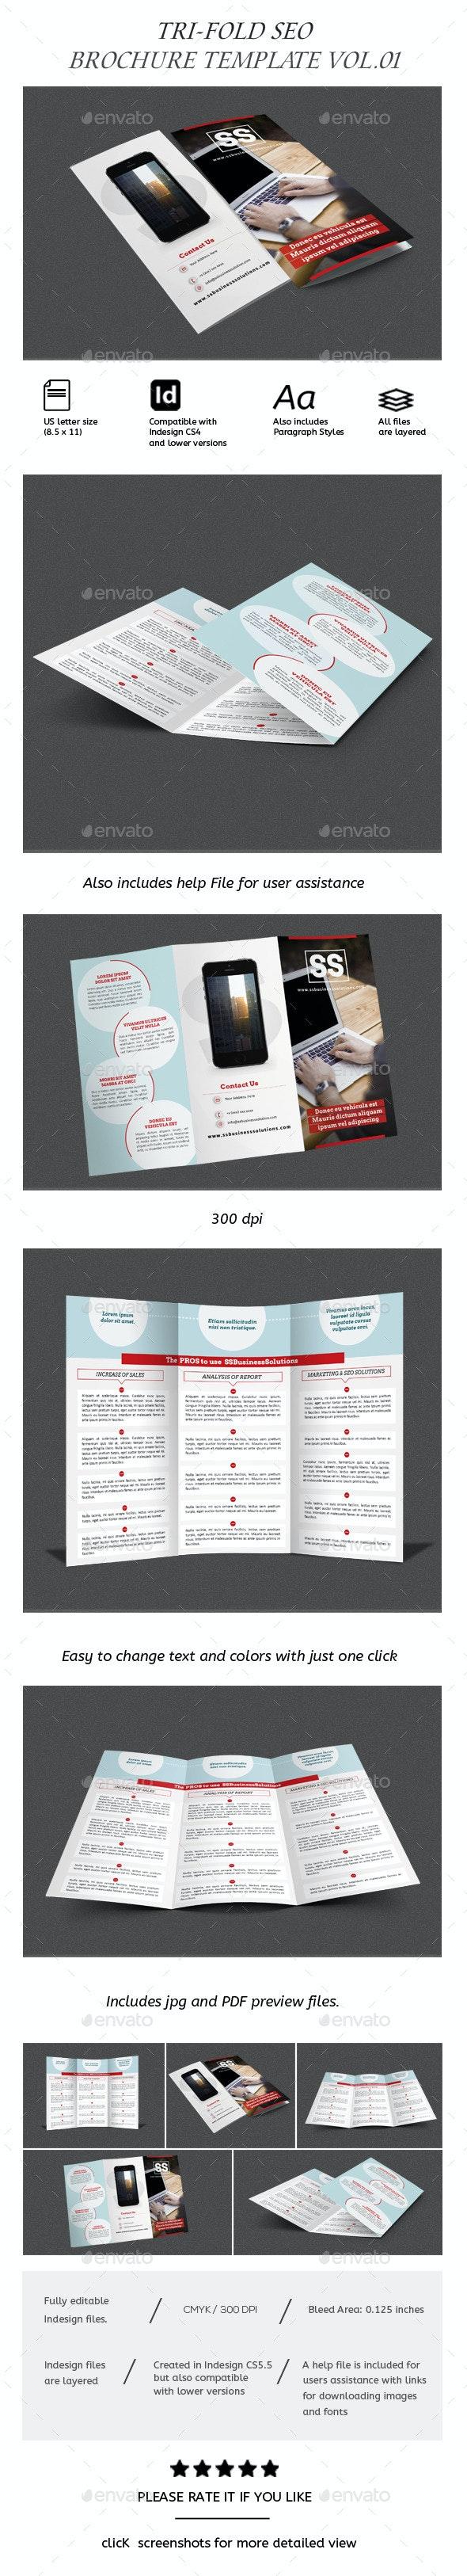 Business Trifold Brochure Vol-III - Corporate Brochures